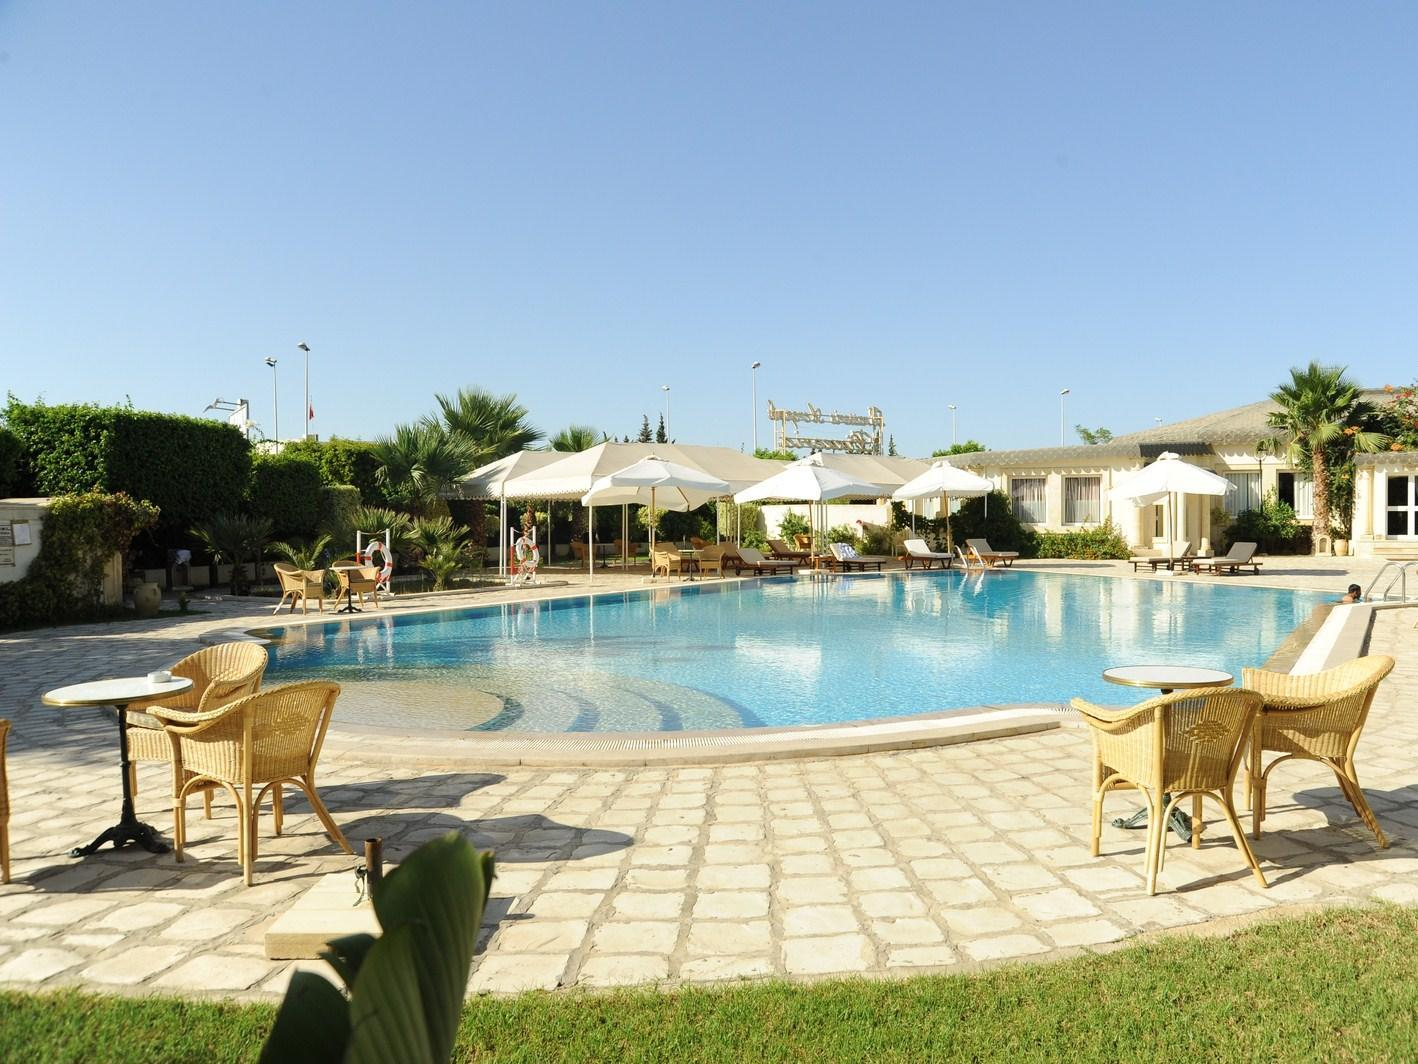 Acropole Tunis Hotel